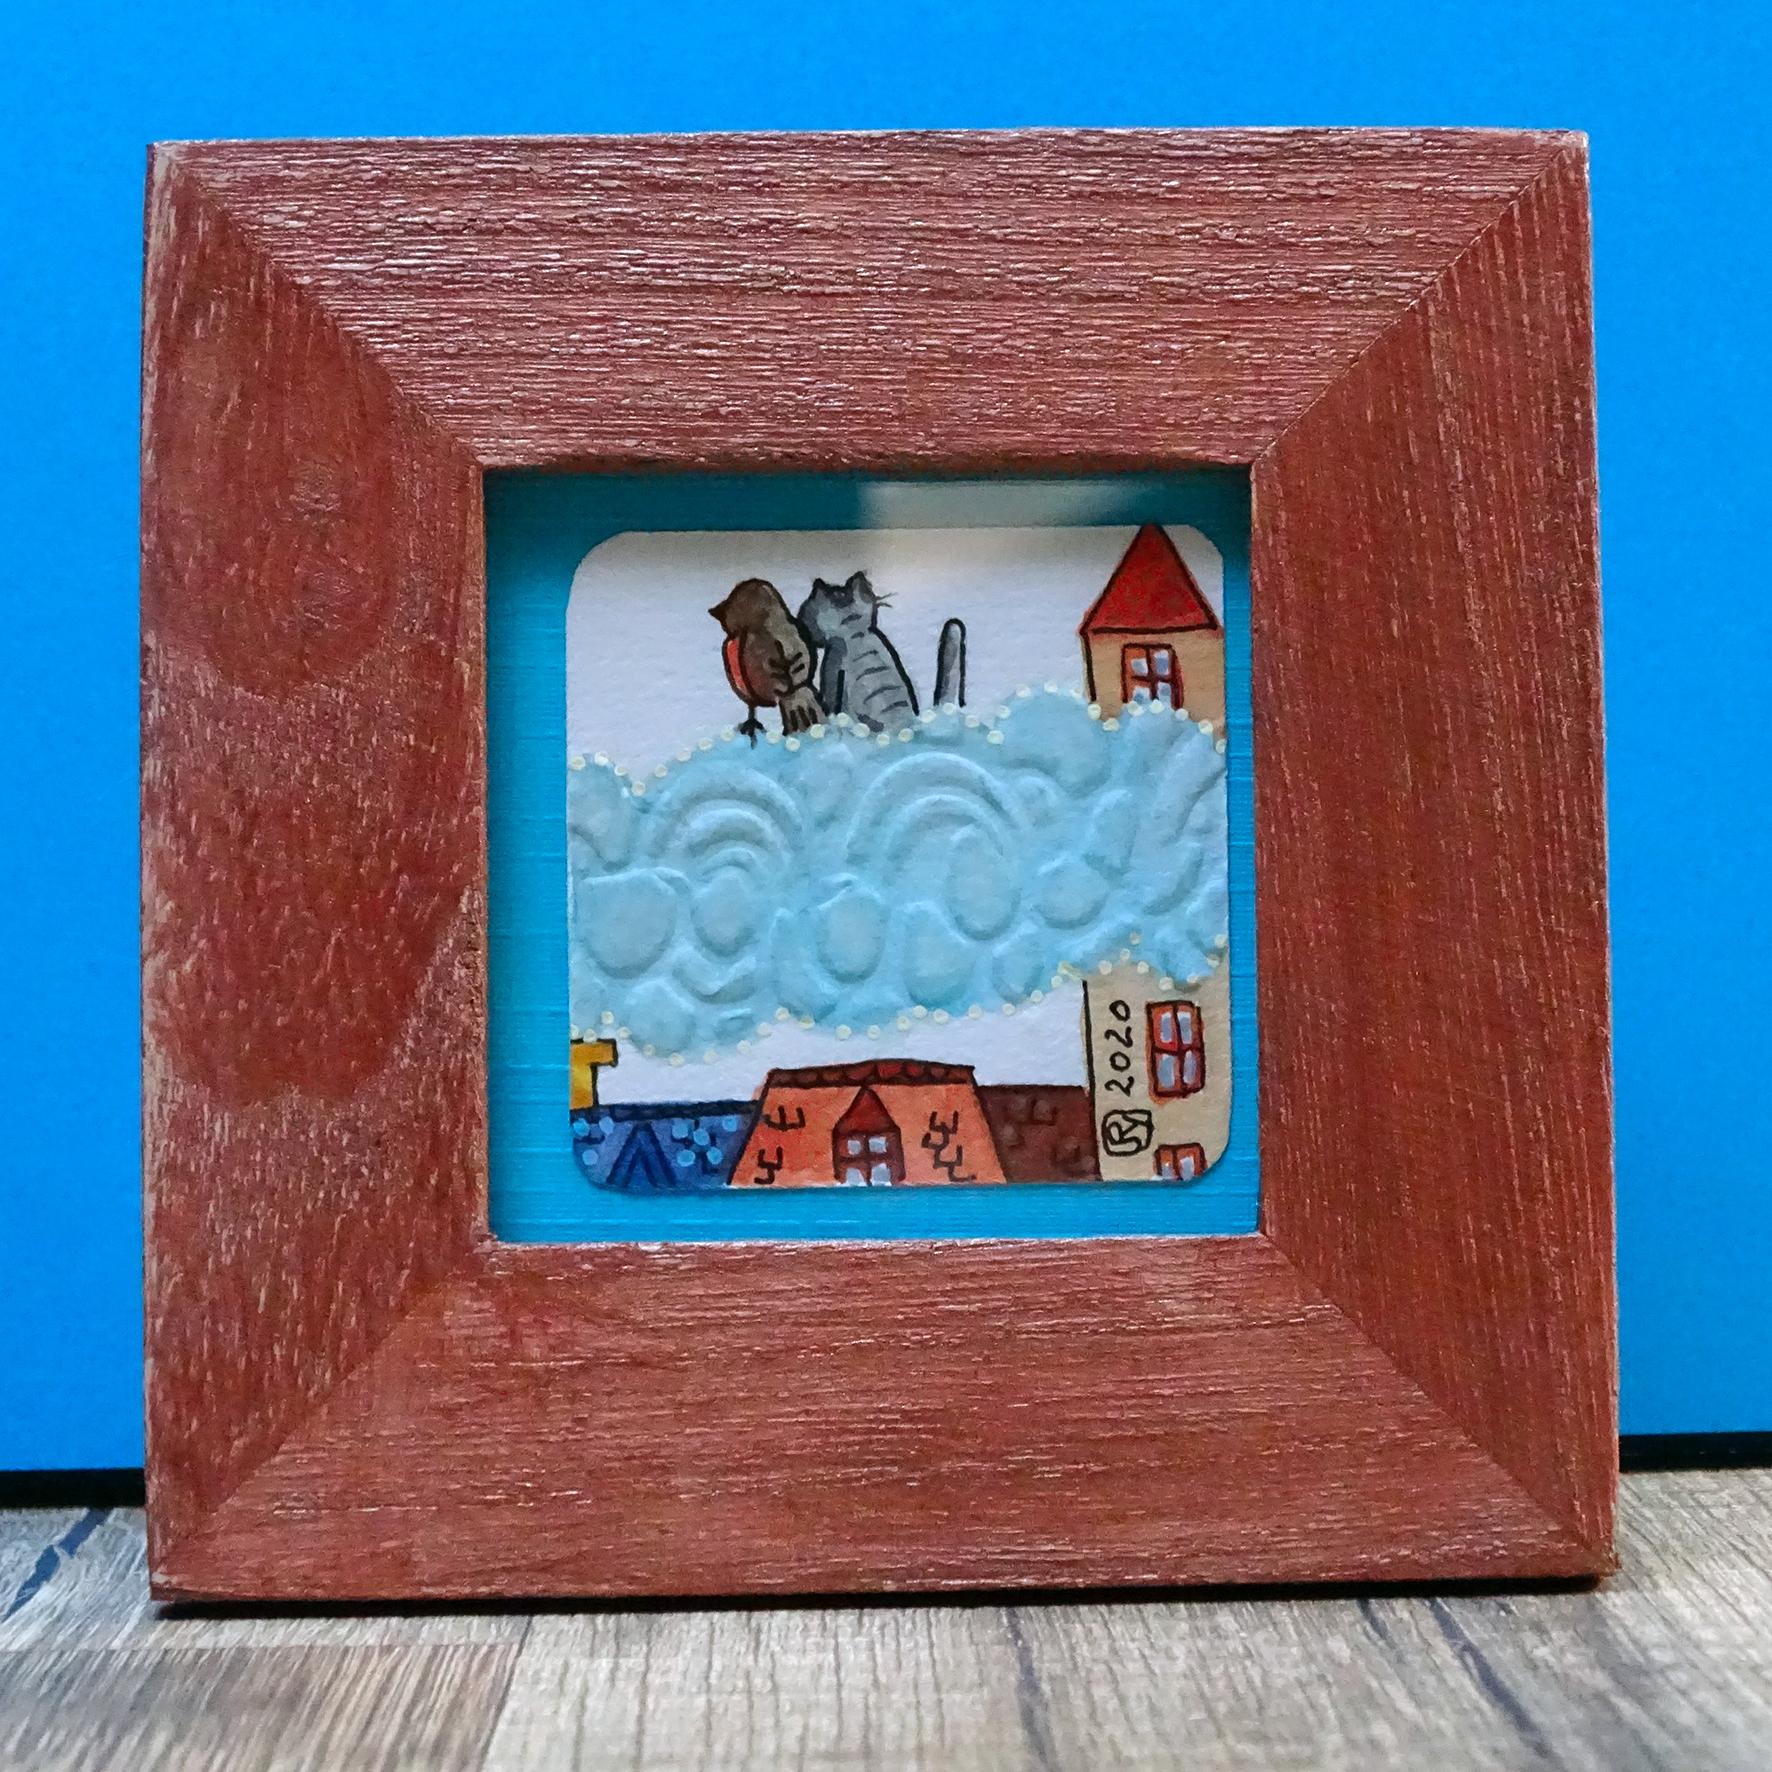 """Par dessus les toits 3"" ©Julia Ratsimandresy / Mini-aquarelle encadrée / Cadre bois bleu+verre 10x10 cm / 15€ hors fdp /Exemplaire unique!"